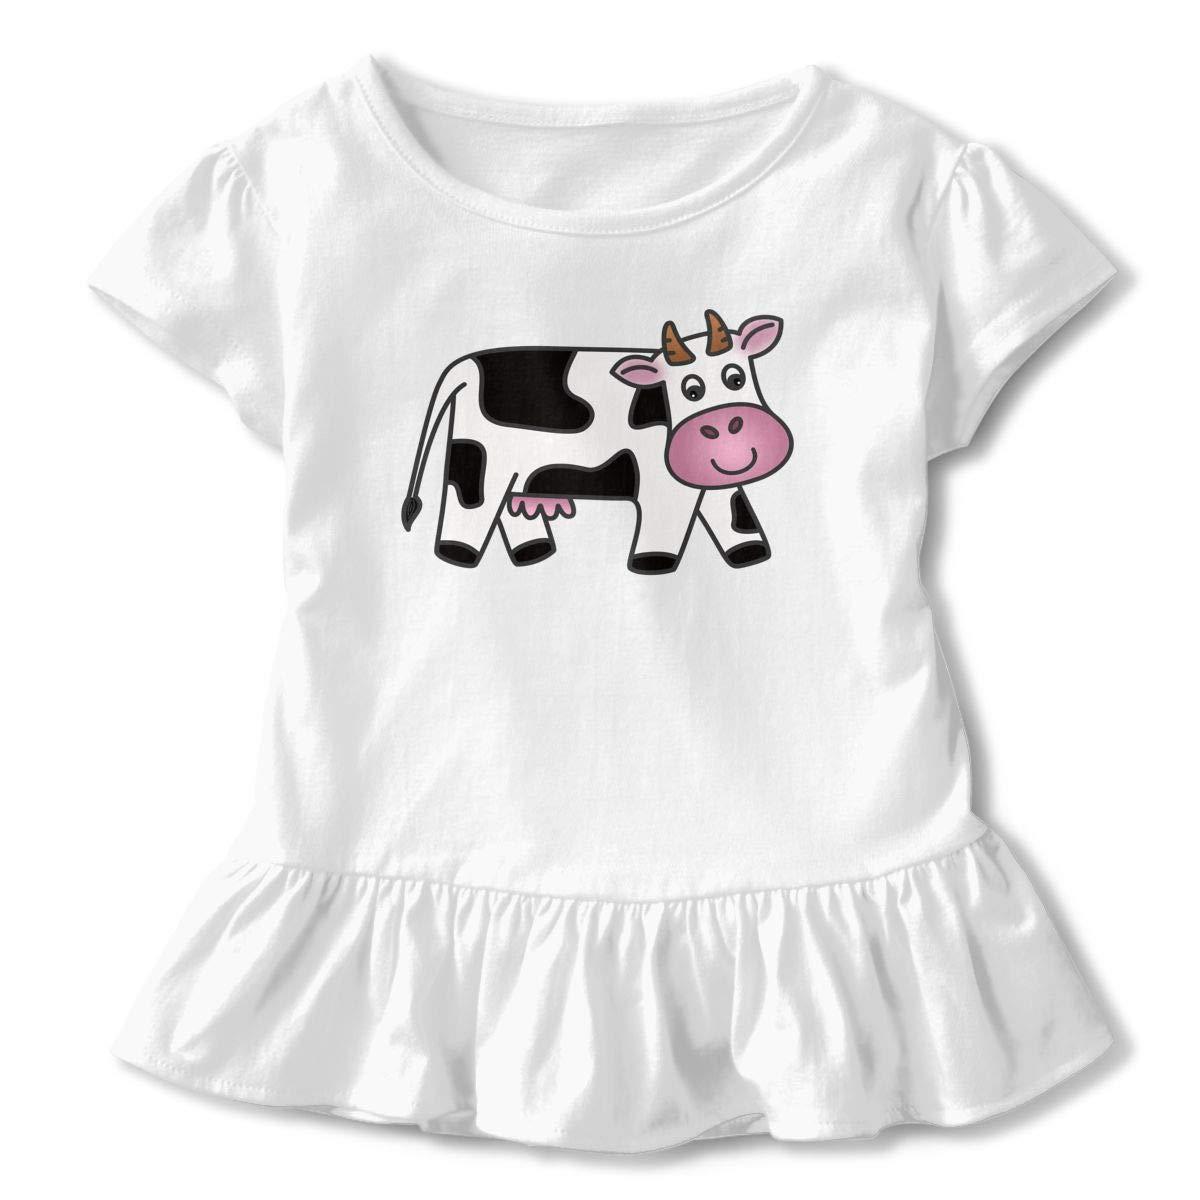 White Milk Cows Cotton Toddler Girls' Short Sleeve Ruffle Tshirts For 2-6T Girl Richard Barajasa